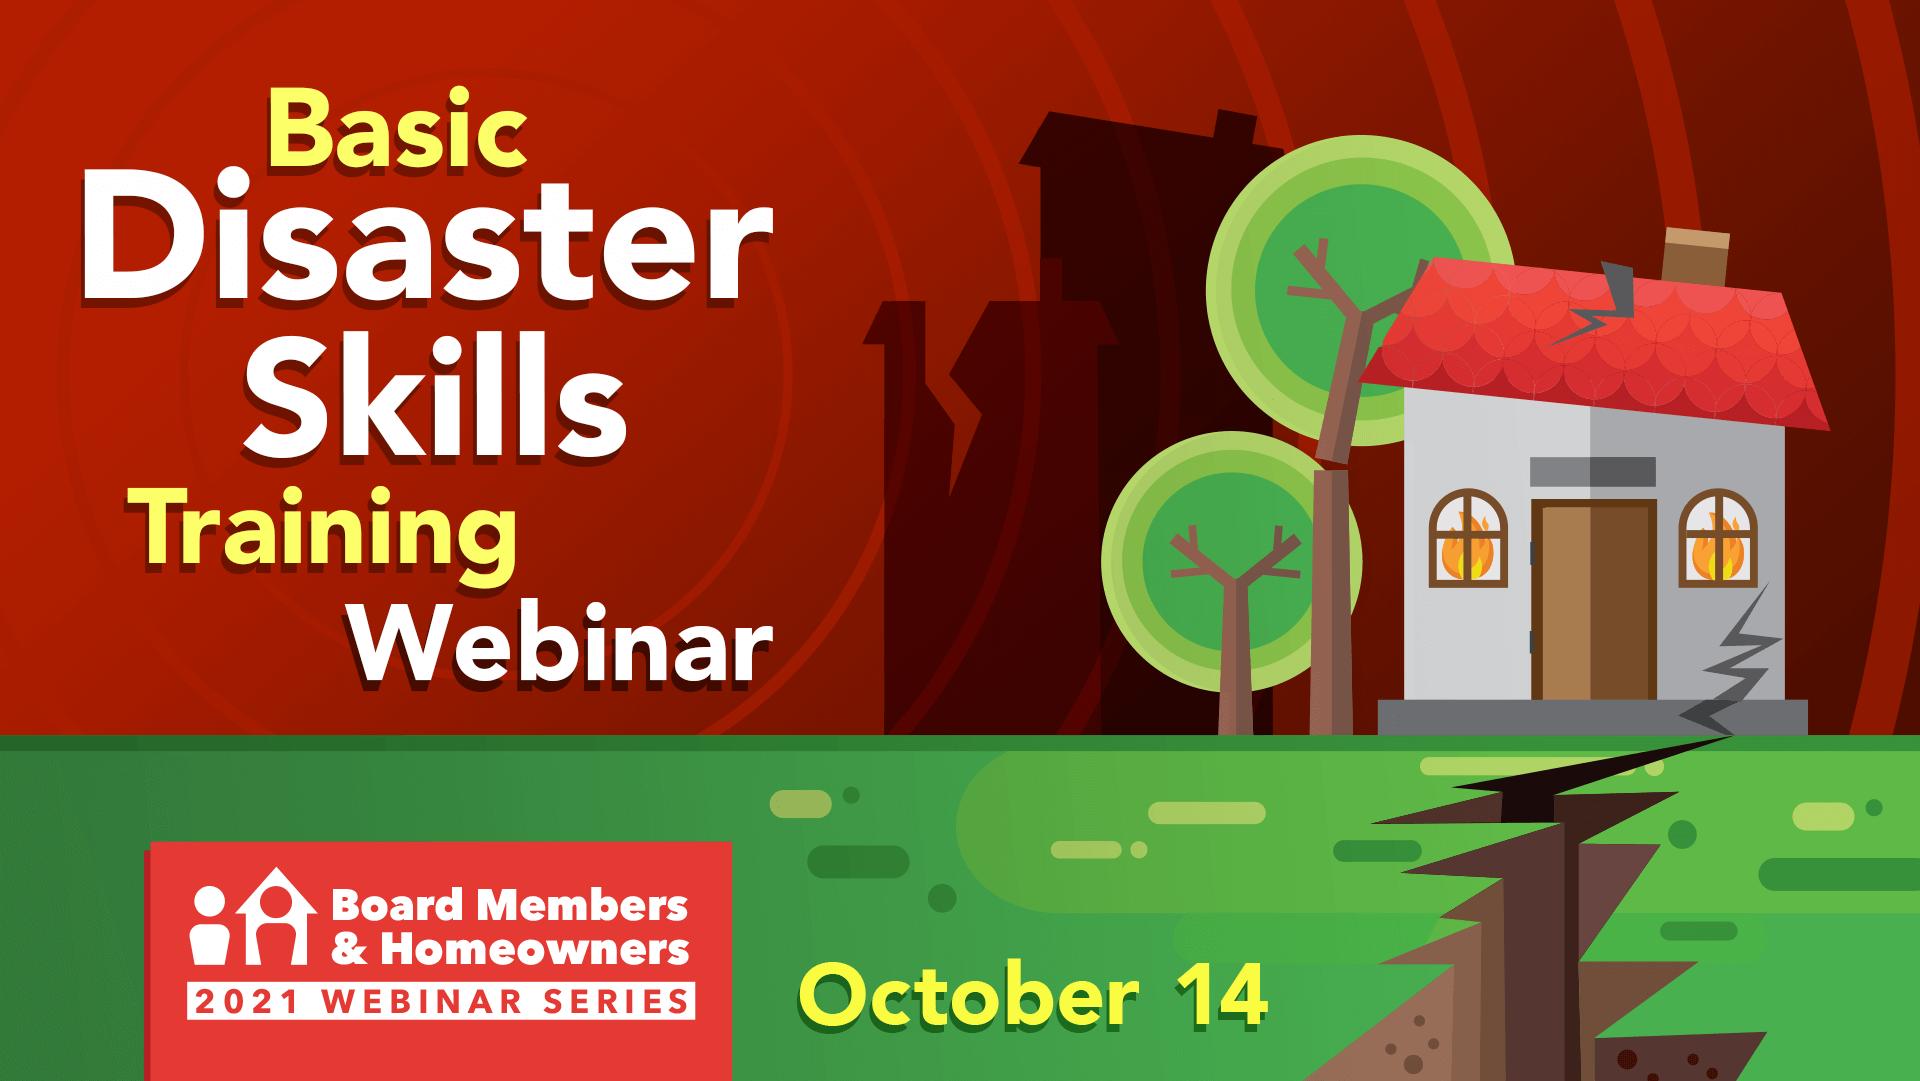 Basic Disaster Skills Training Webinar